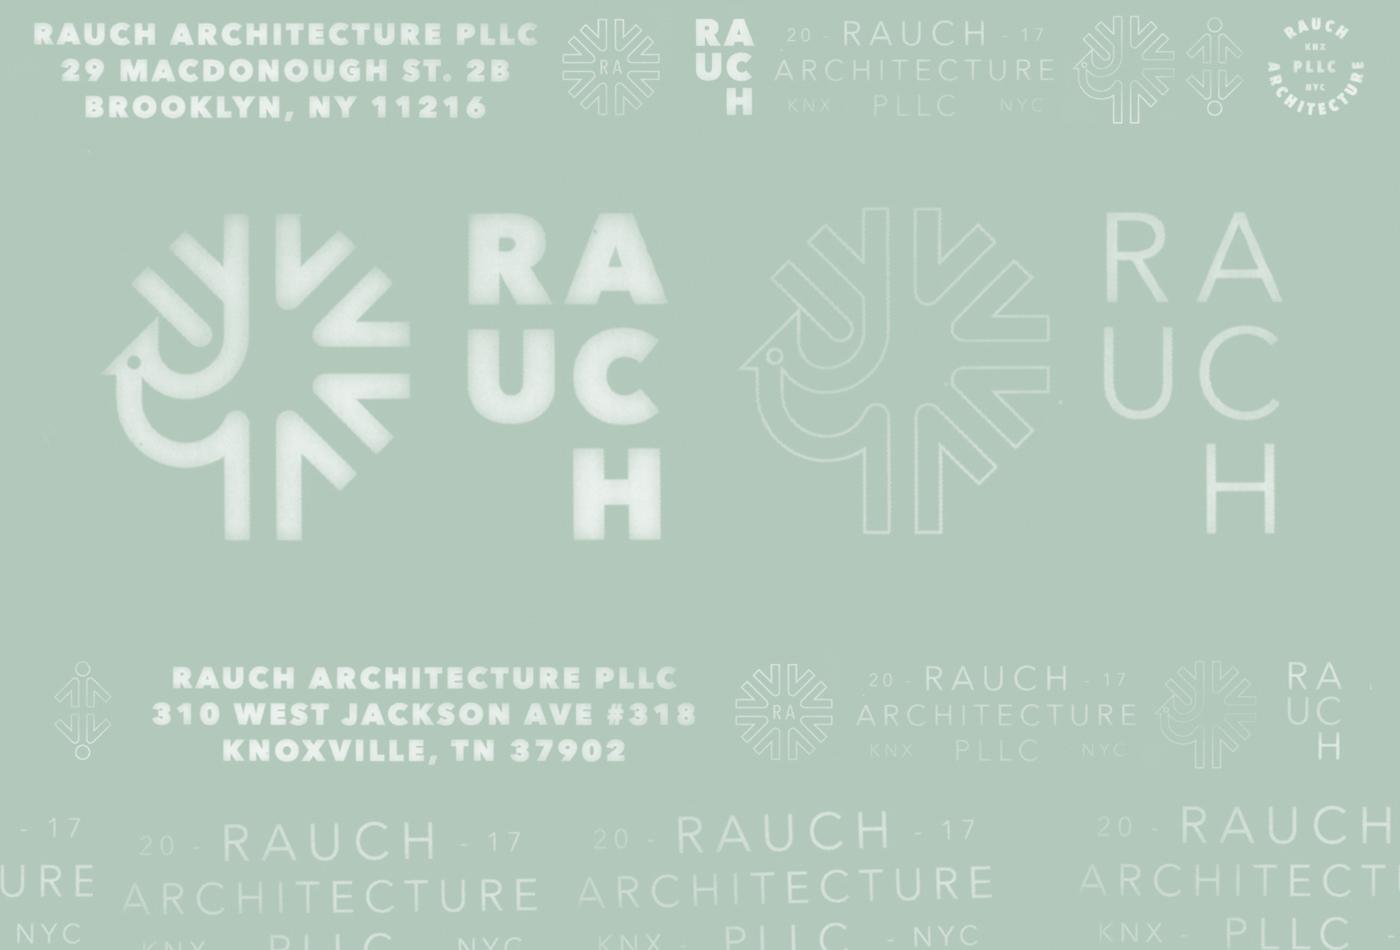 ra-rauch-architecture-matthew-rauch-architecture-pllc-nyc-brooklyn-knx-architect-ppx-modernism-passengerpigeonx-vacaliebres-marks